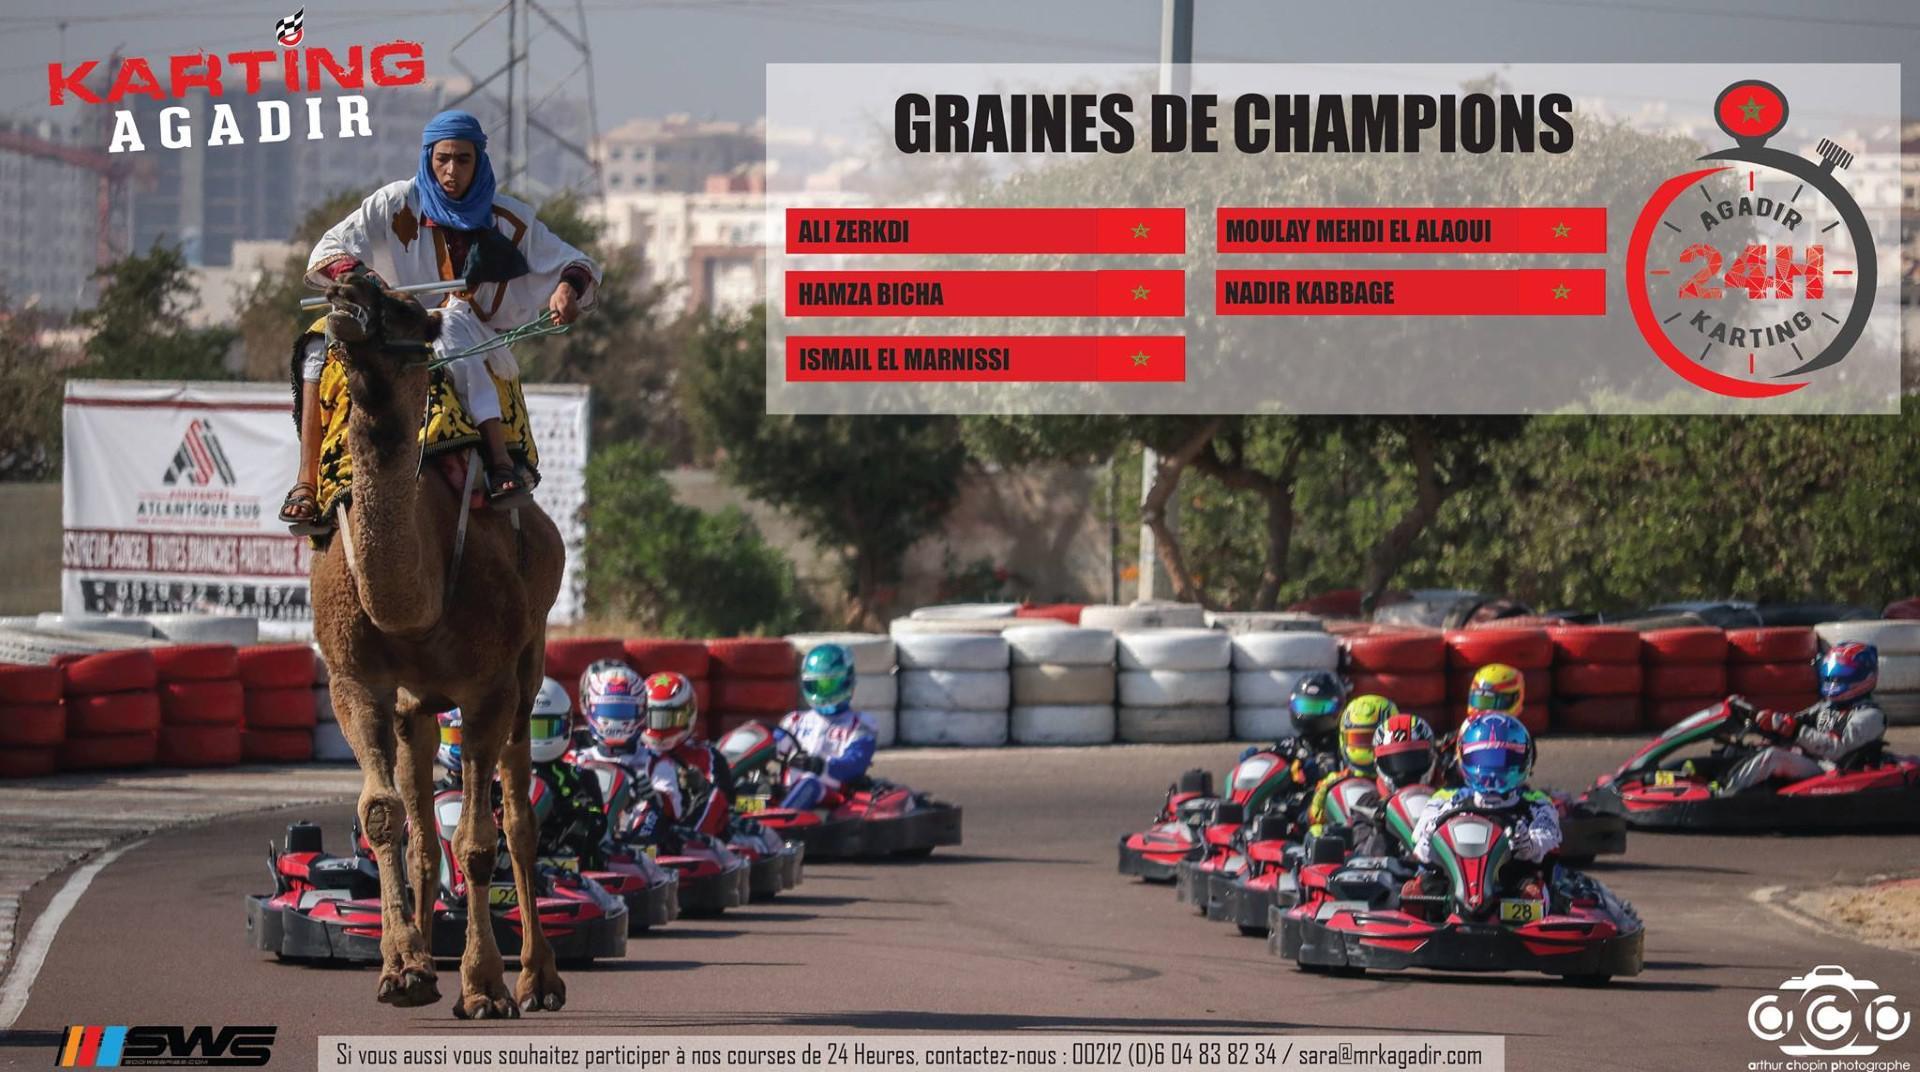 24h-karting-d-agadir-manche-1-915-6.jpg